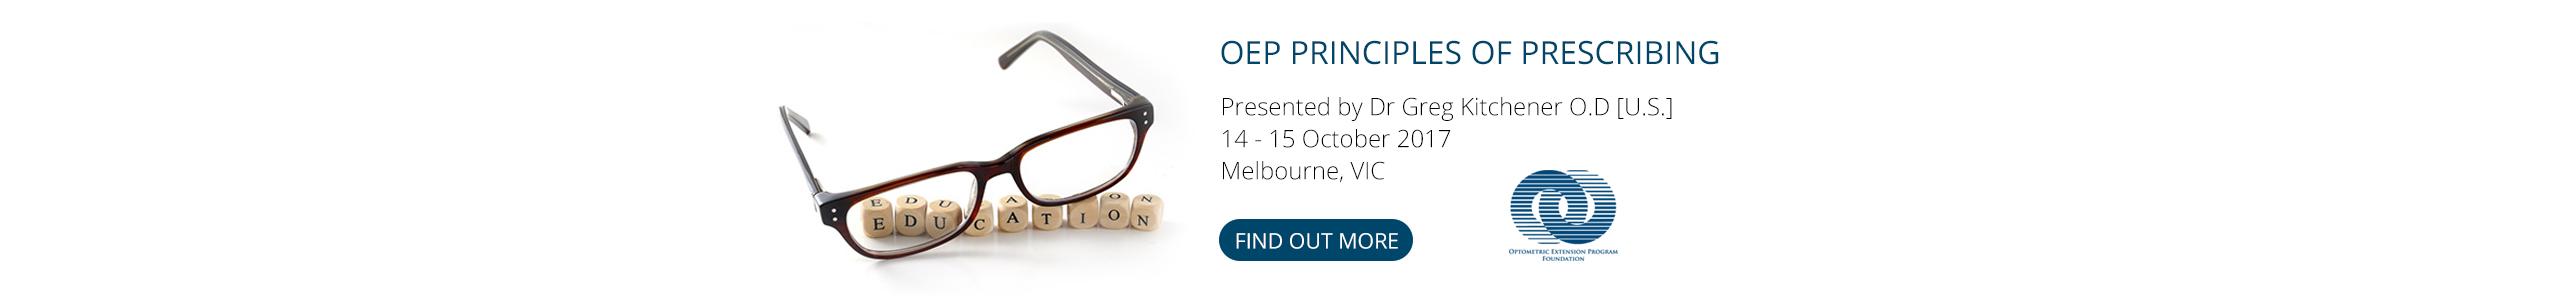 OEP-Principals-of-Prescribing-banners